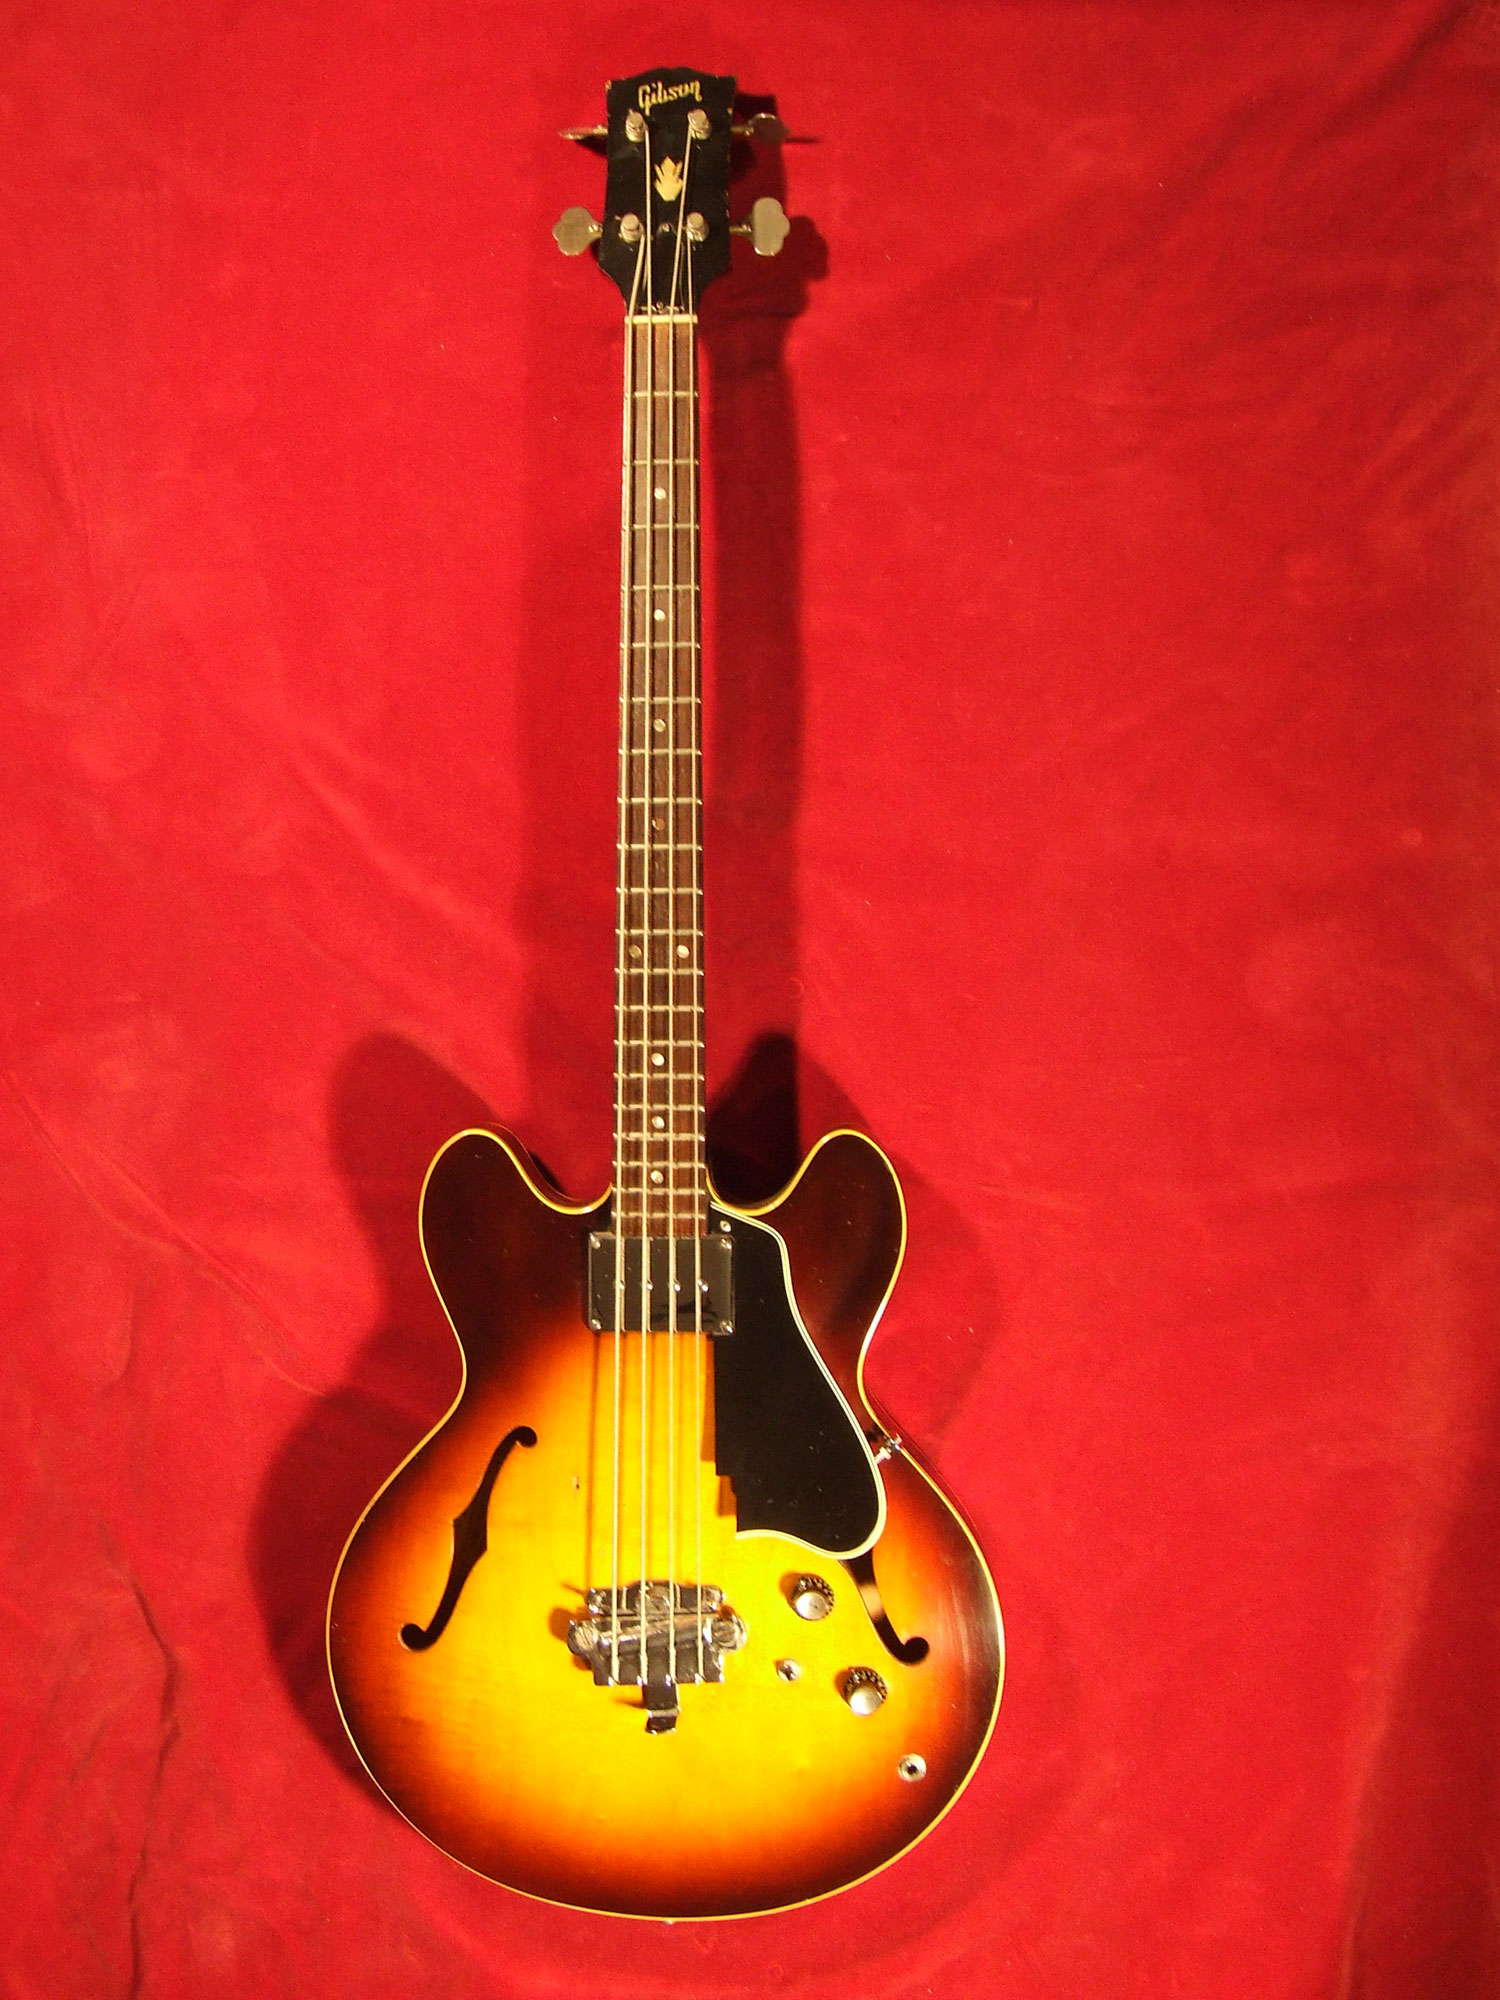 Gibson EB-2 Electric Bass Guitar eBay